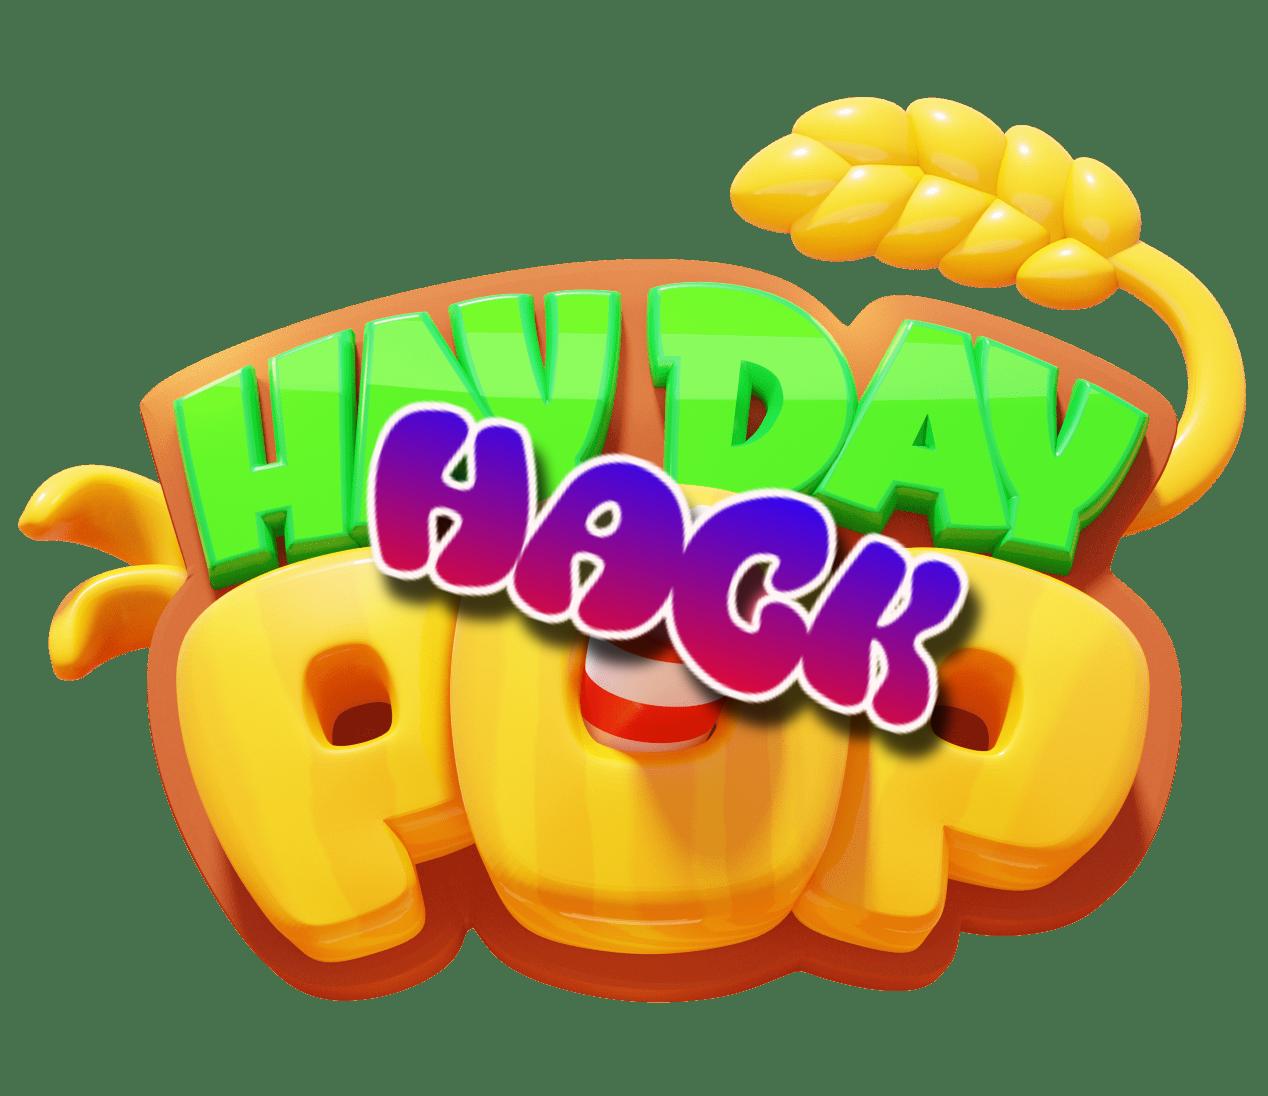 Hay Day Pop Cheats Hack for Infinite Diamonds Mod APK